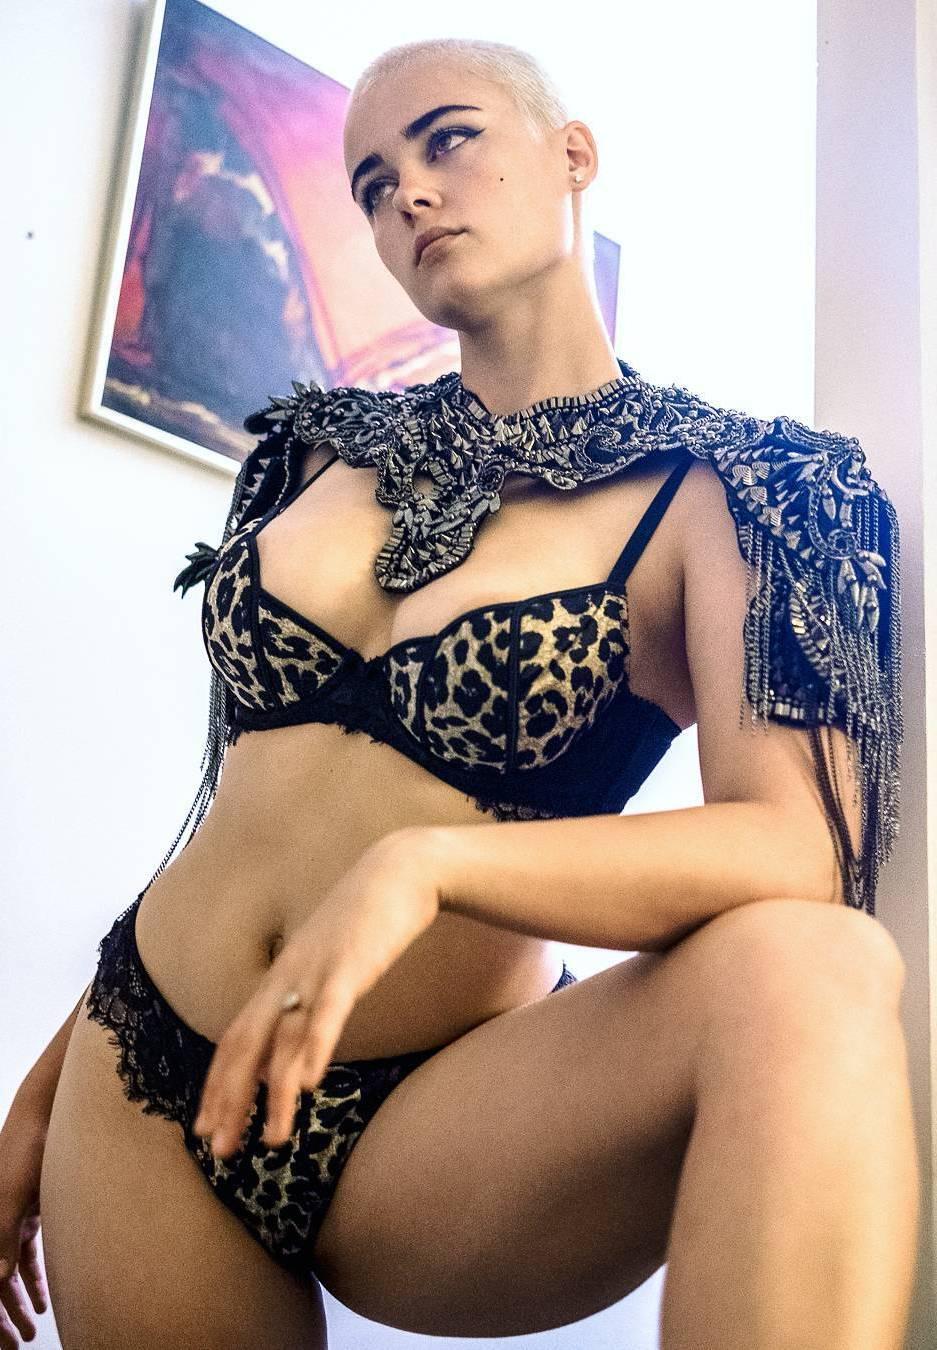 Sideboobs Stefania Ferrario nude (93 photos), Sexy, Hot, Feet, panties 2018